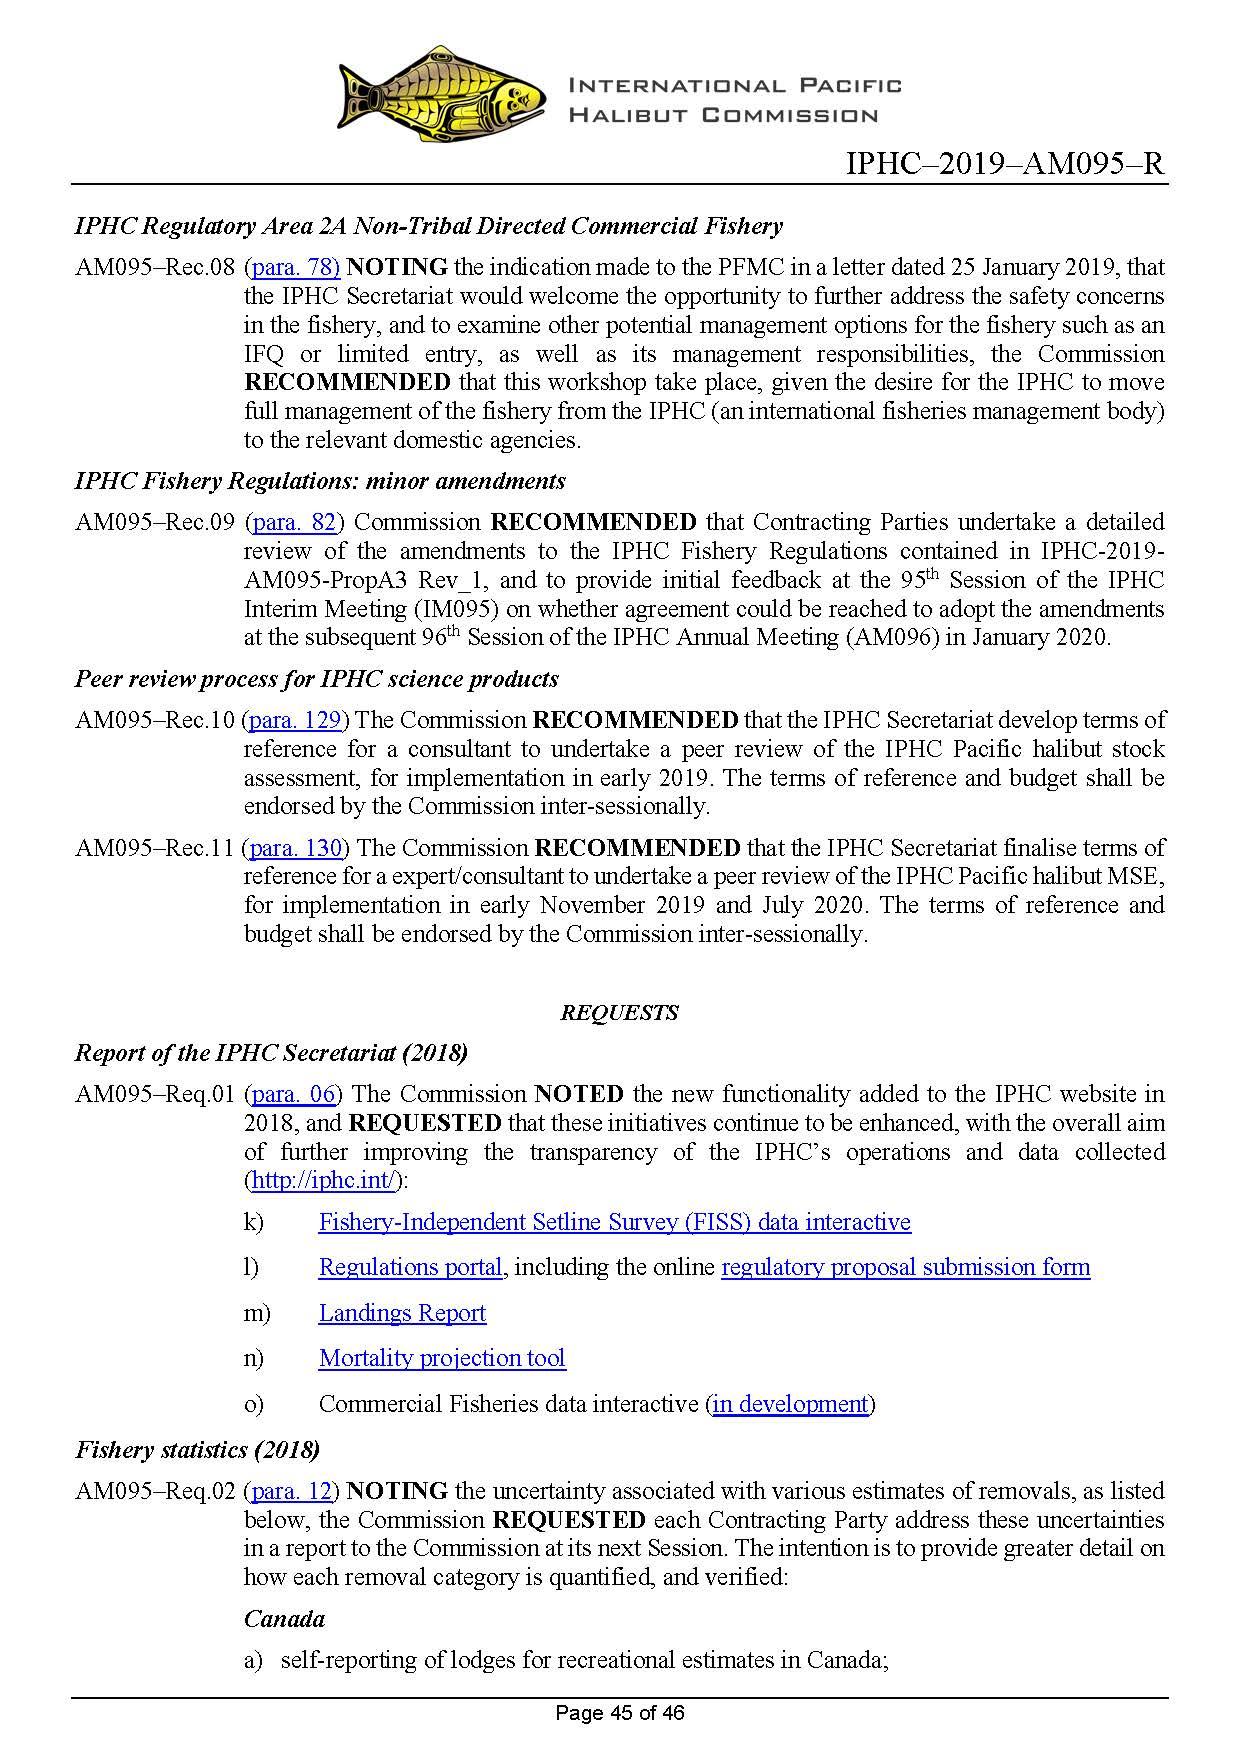 iphc-2019-am095-r_Page_45.jpg